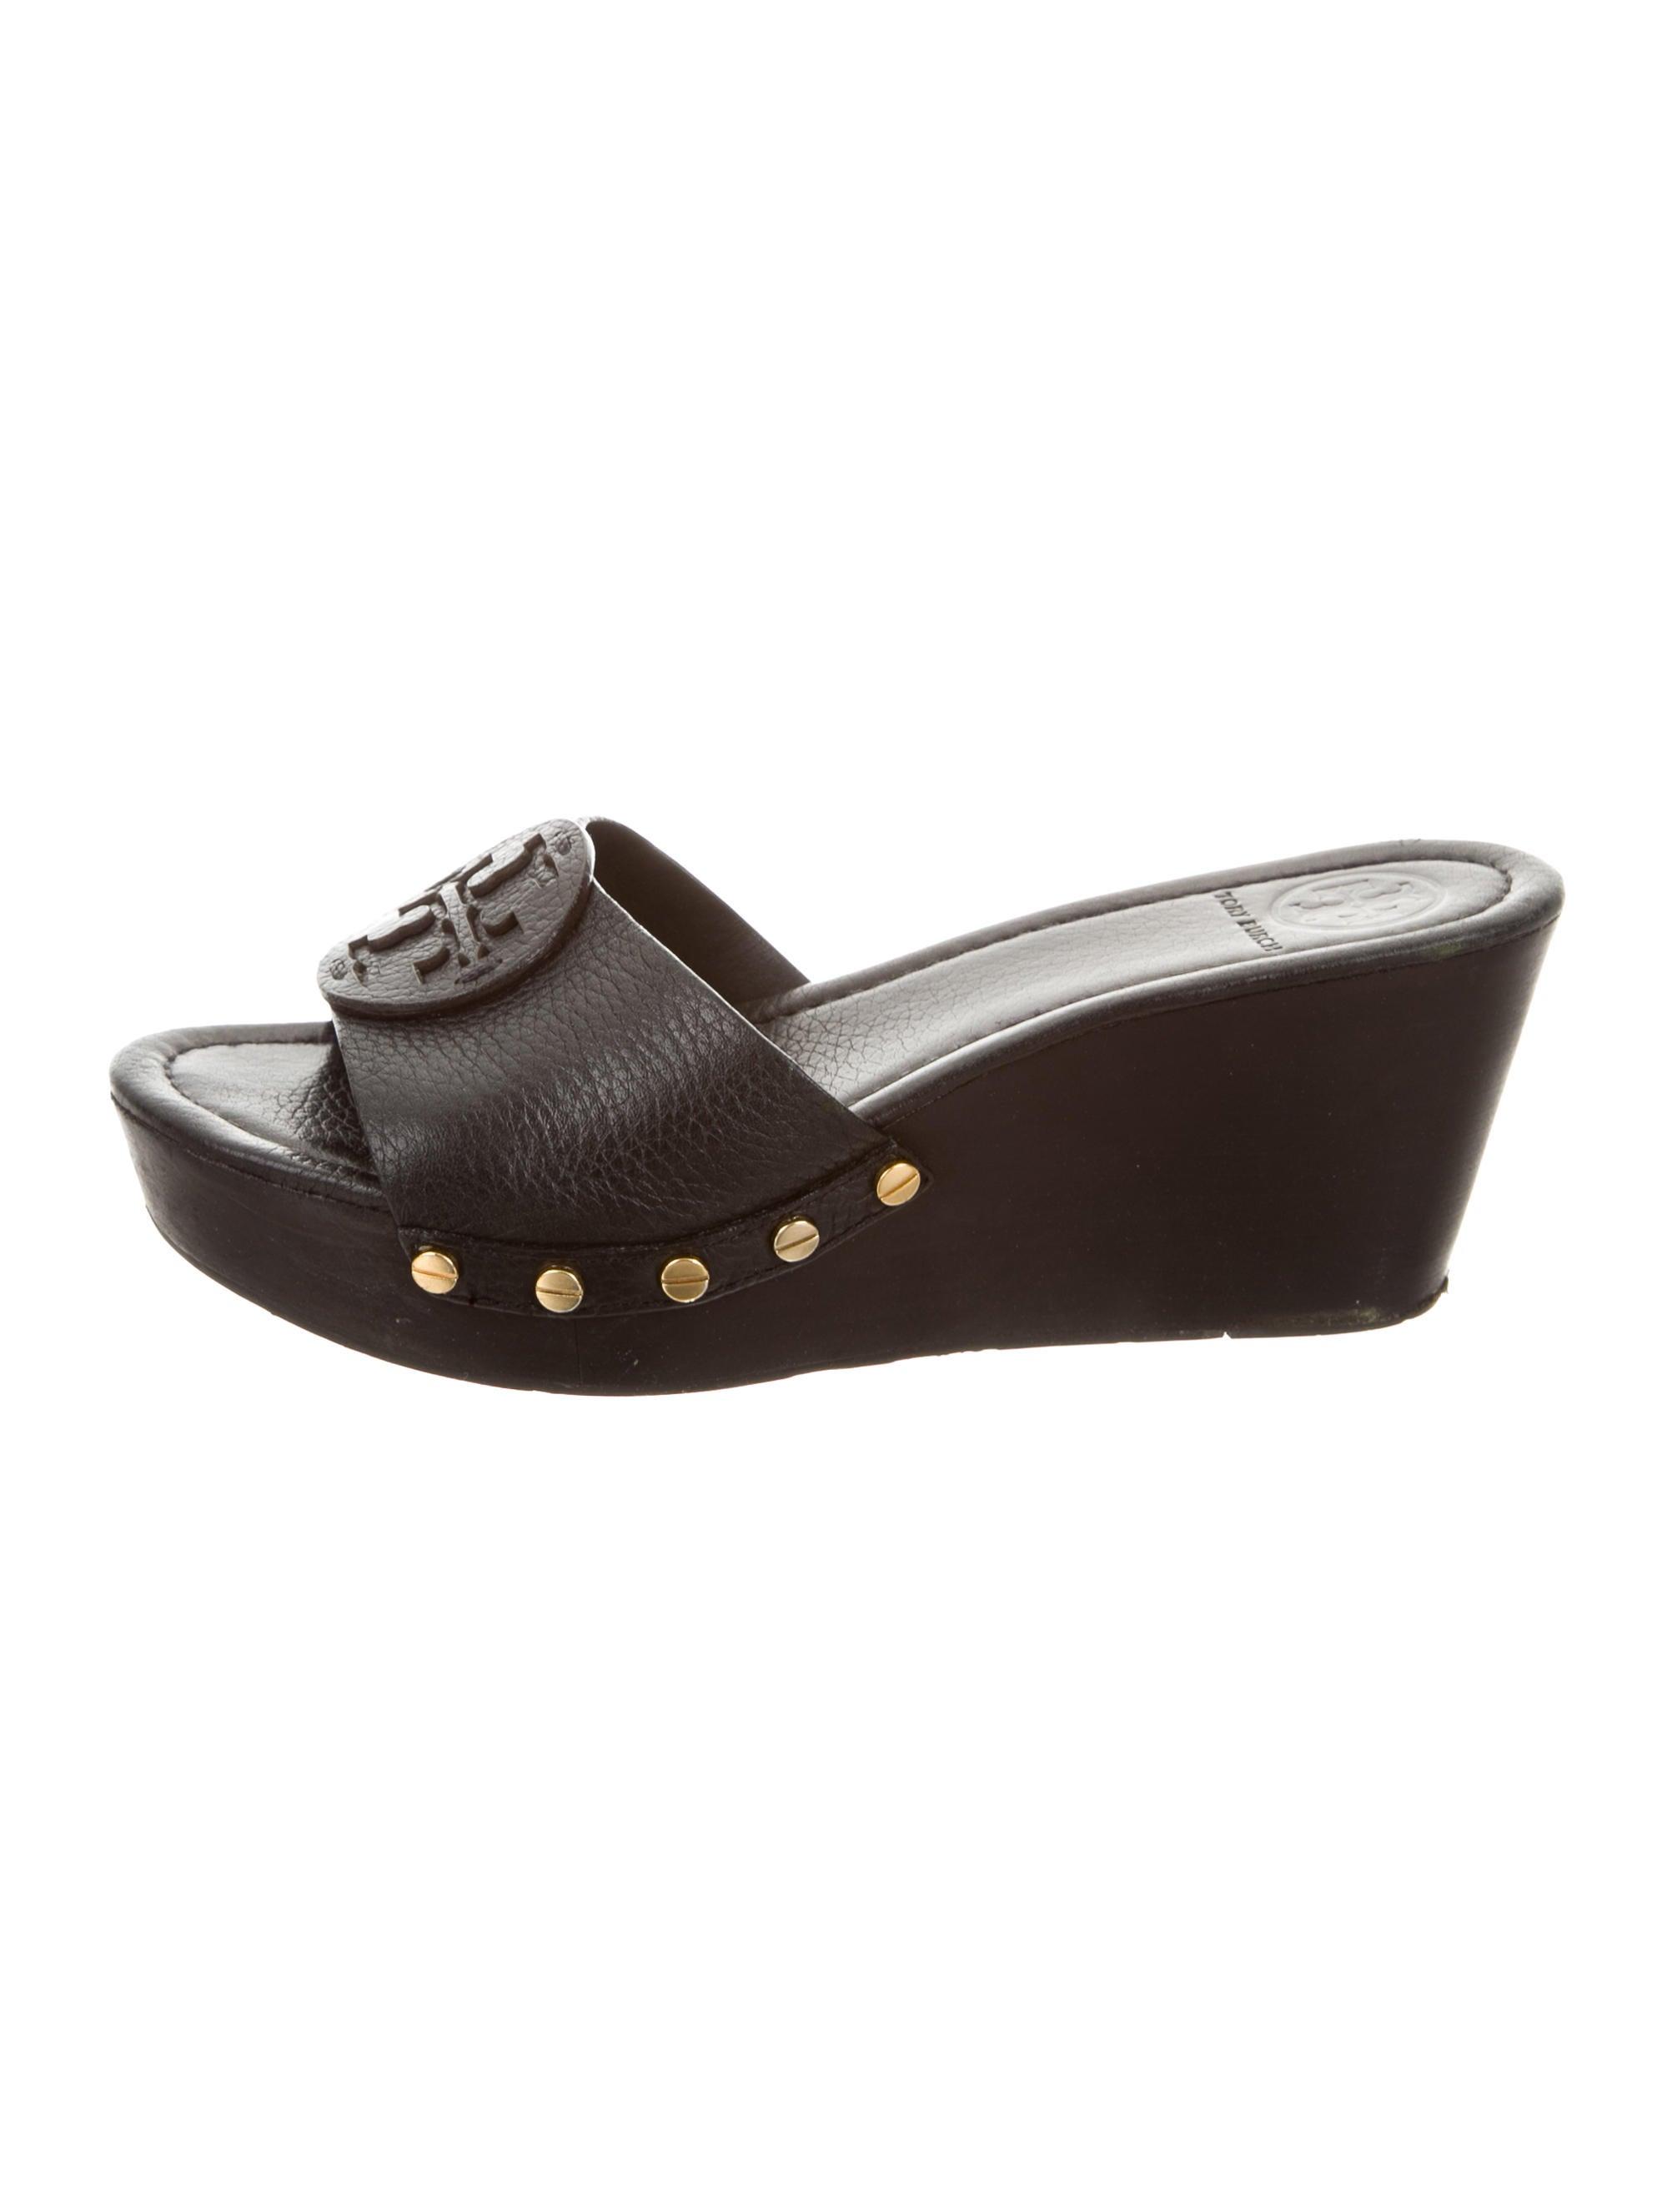 ec4796c23fe Tory Burch Patti Wedge Sandals - Shoes - WTO86266